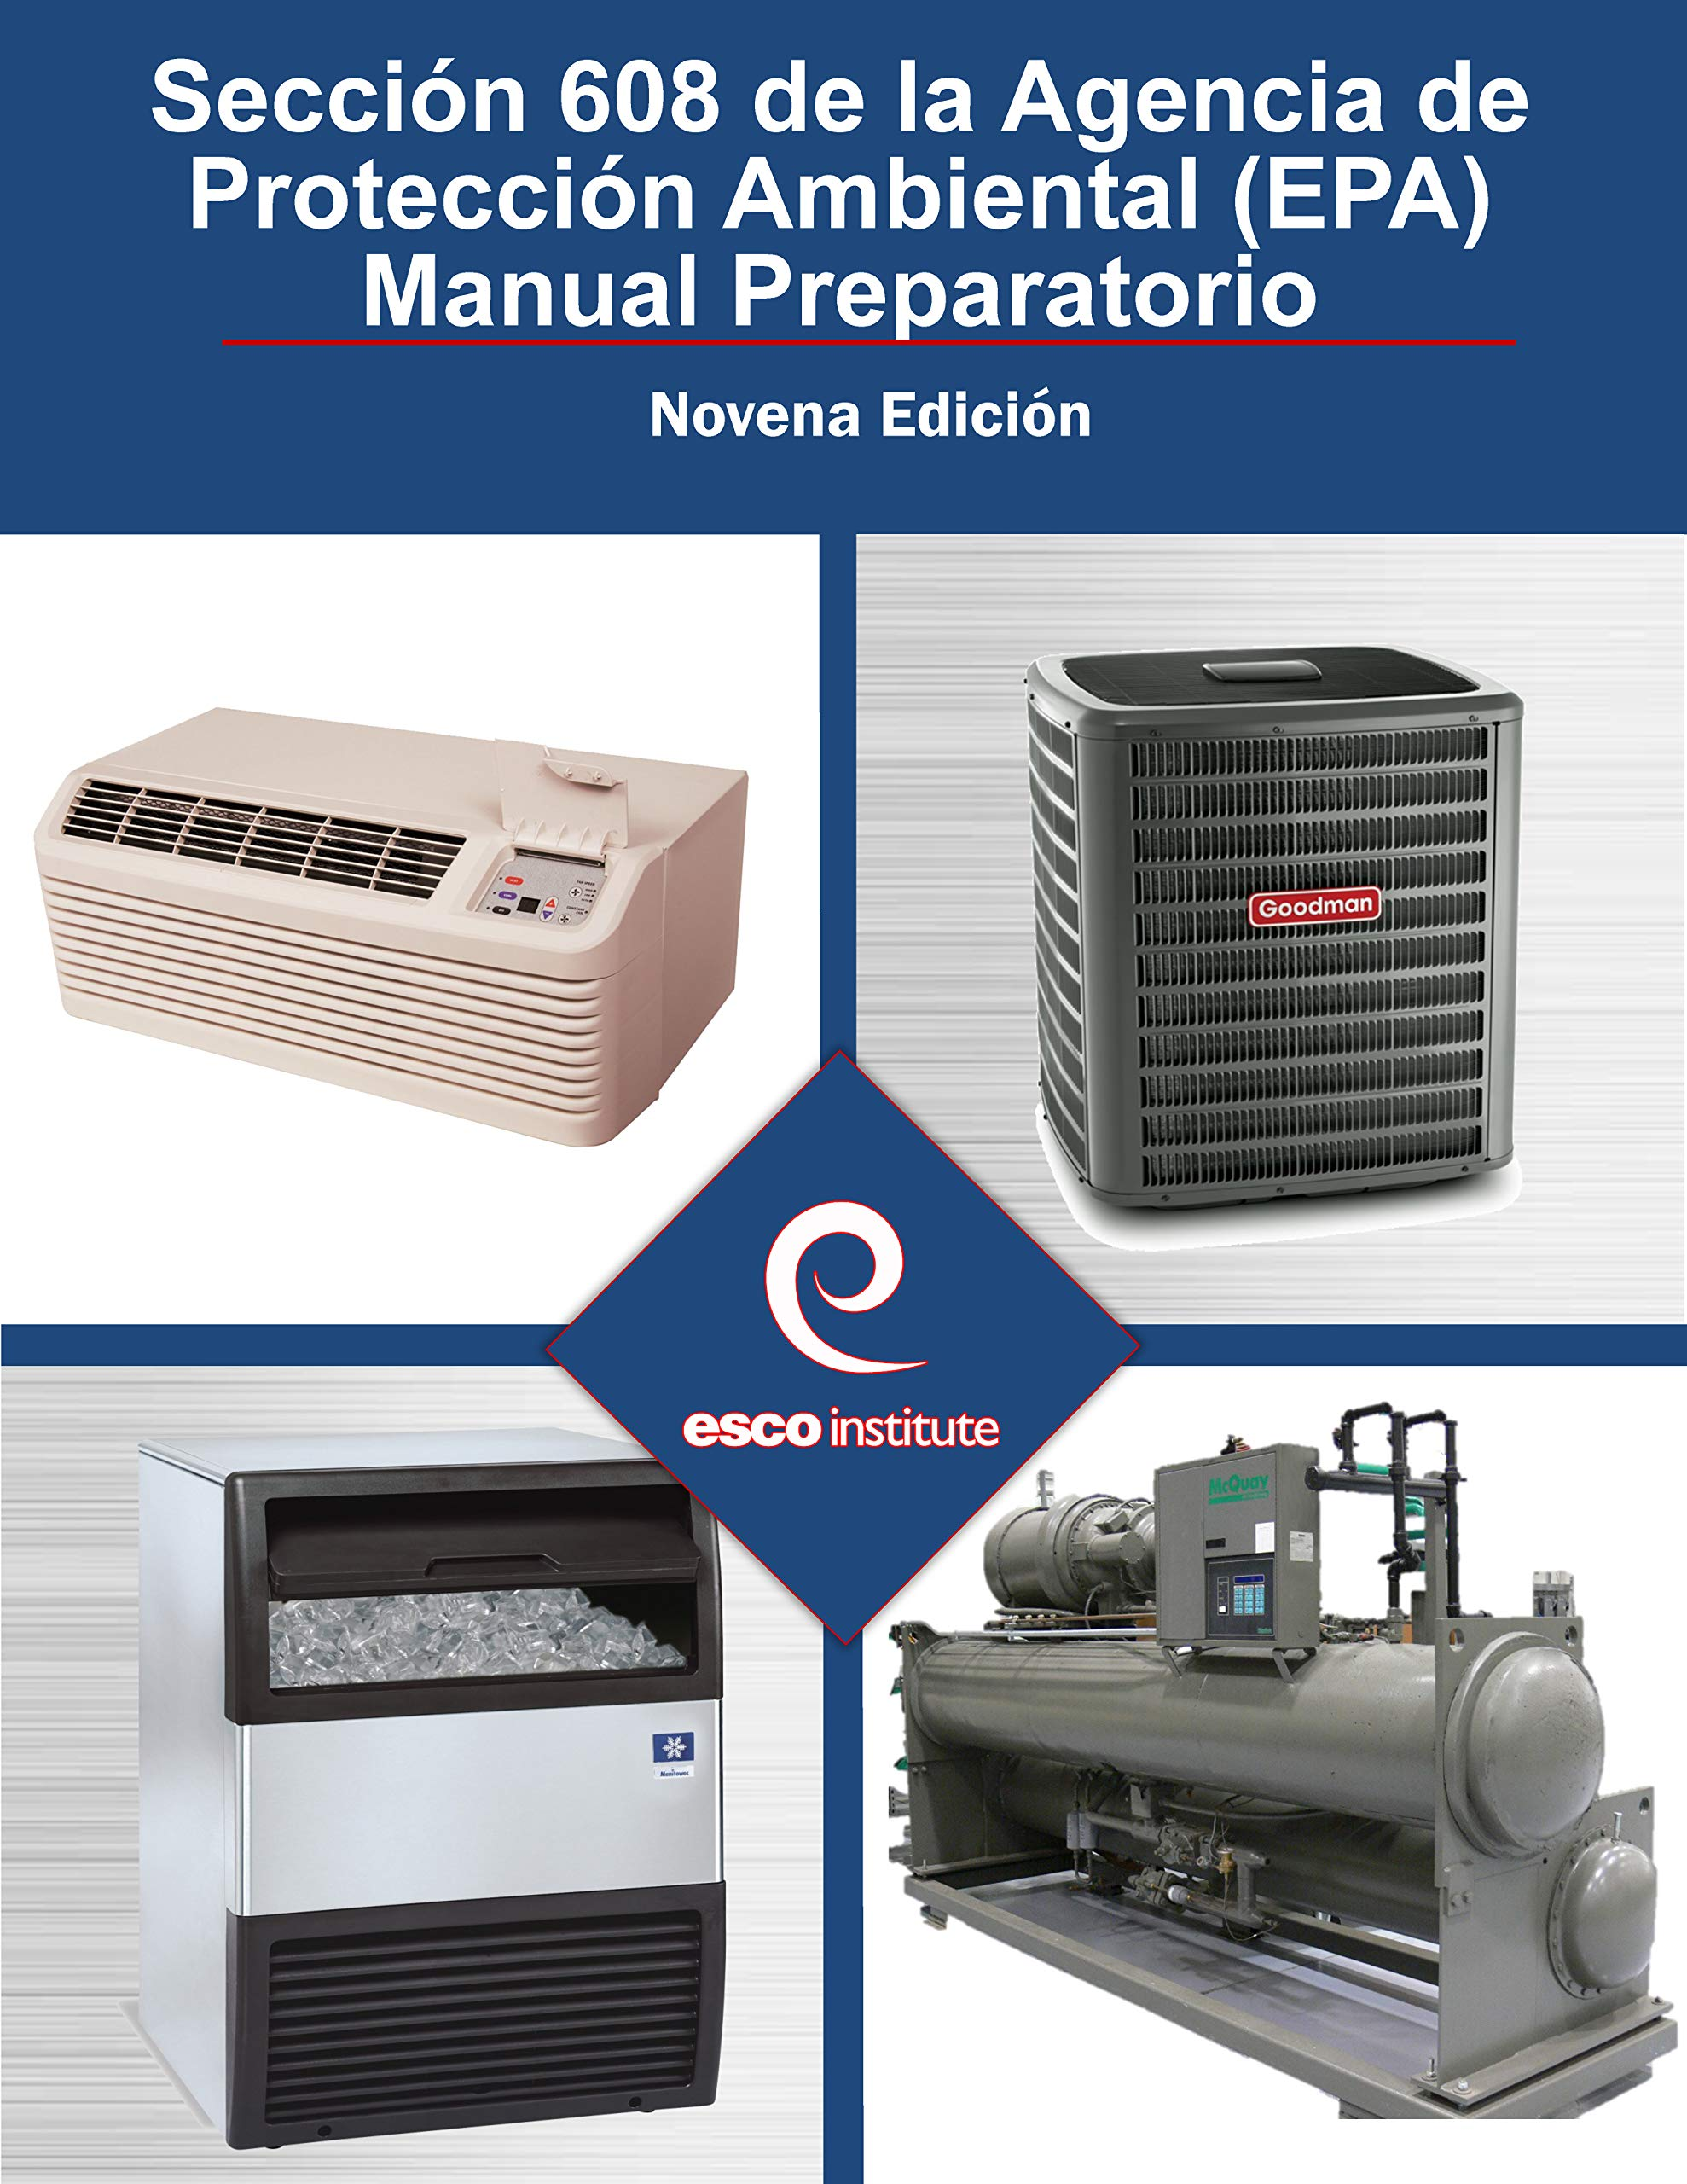 Institute Seccion Protecci%C3%B3n Ambiental Preparatorio product image